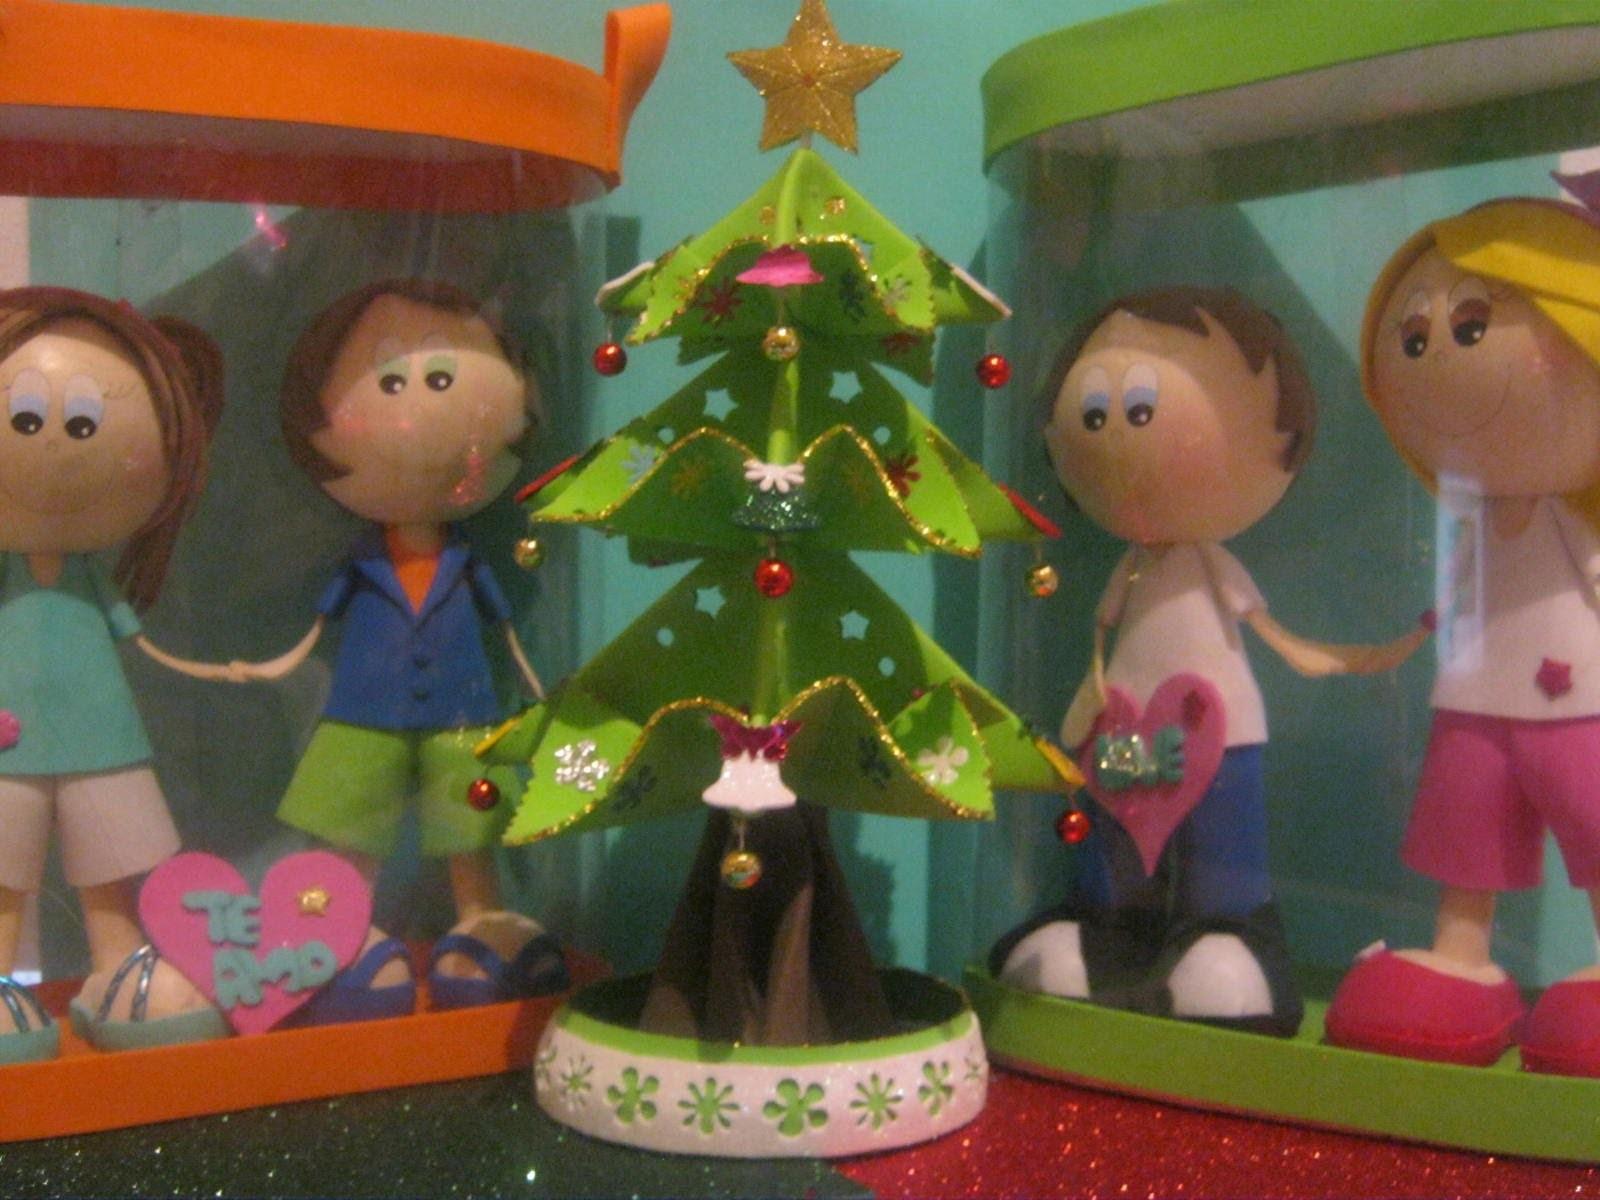 NUEVO Christmas Tree Arbolito De Navidad Fofucho 3D Foamy Artfoamicol Fofuchas Navideñas Moldes